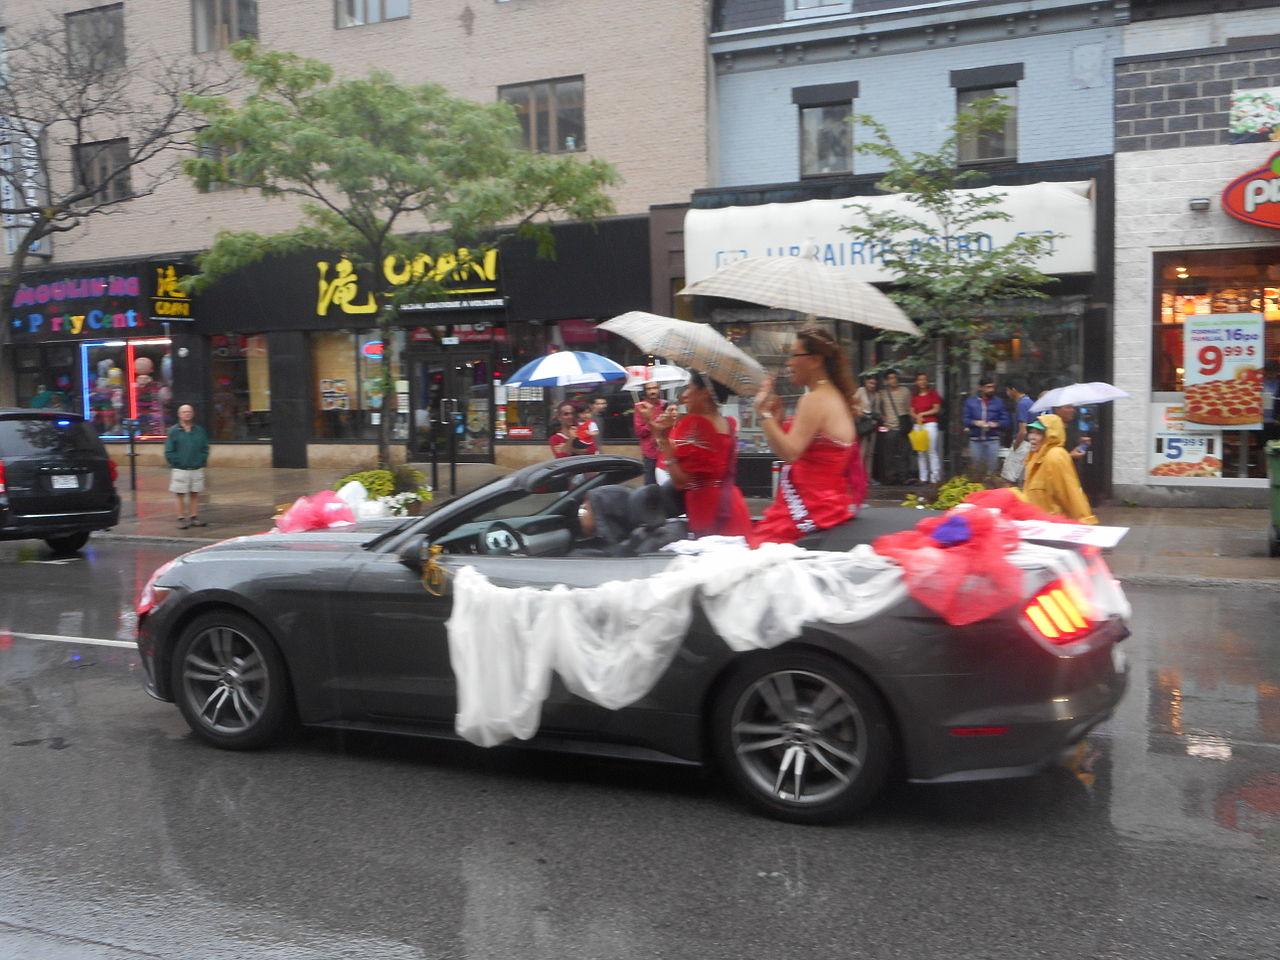 File:Canada Day 2015 on Saint Catherine Street - 296.jpg - Wikimedia